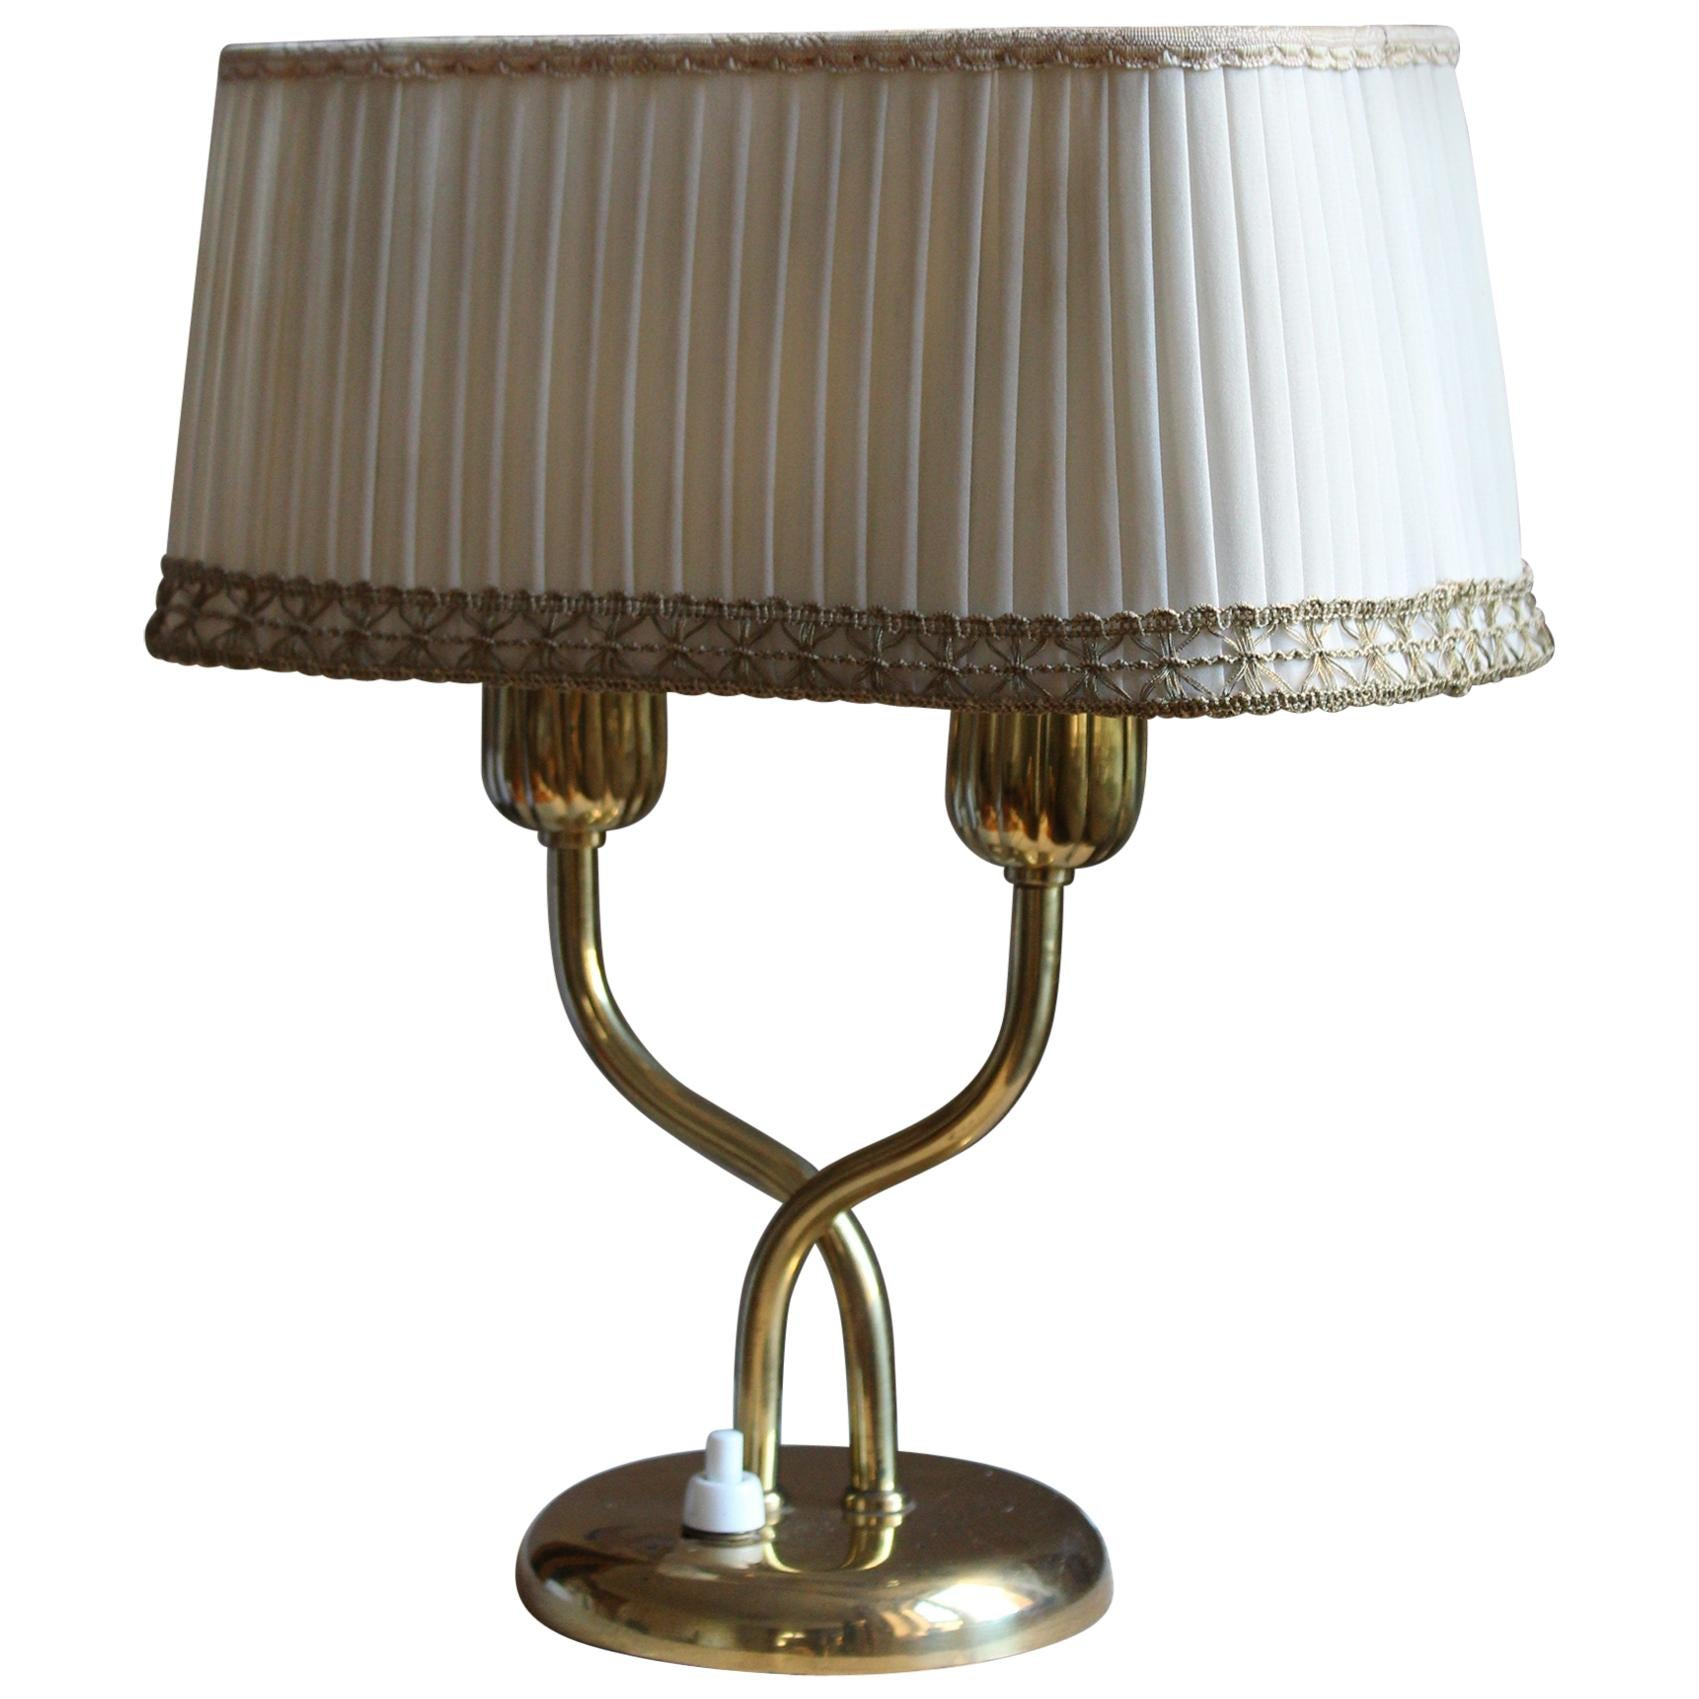 Böhlmarks, Organic Table Lamp, Brass, Fabric, Sweden, 1940s